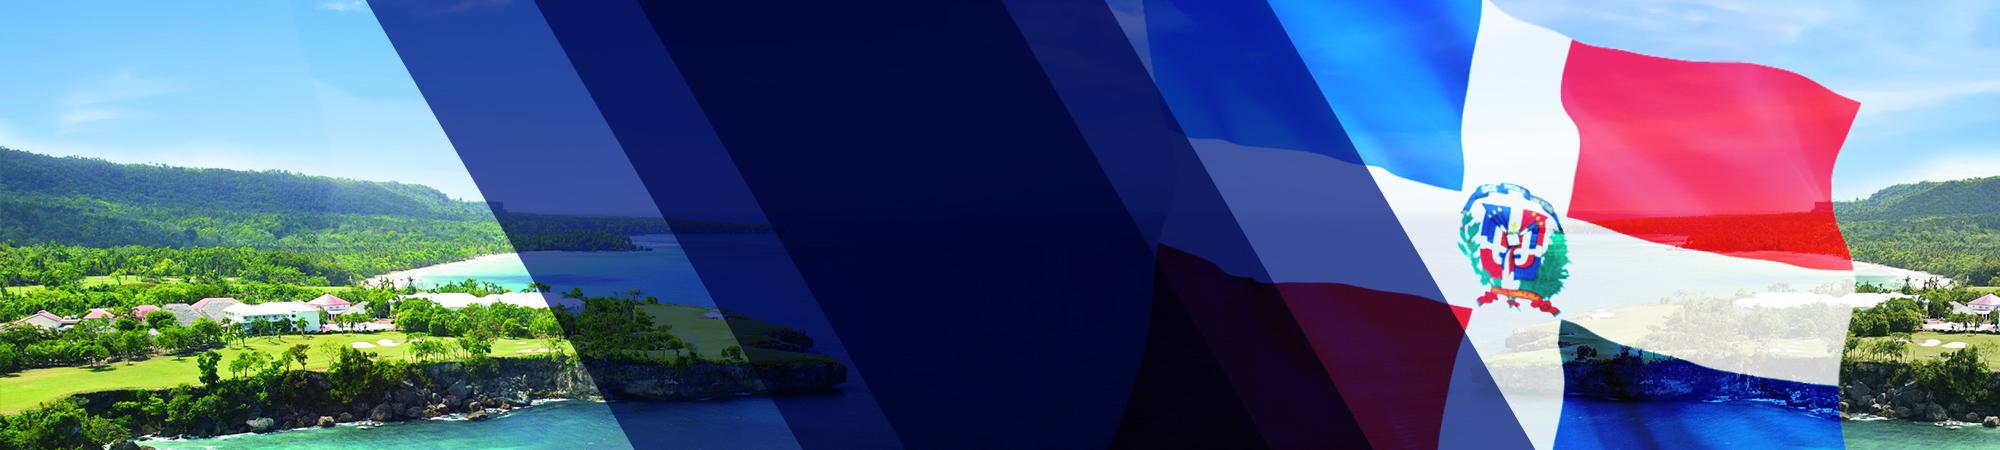 banner-fondo-1